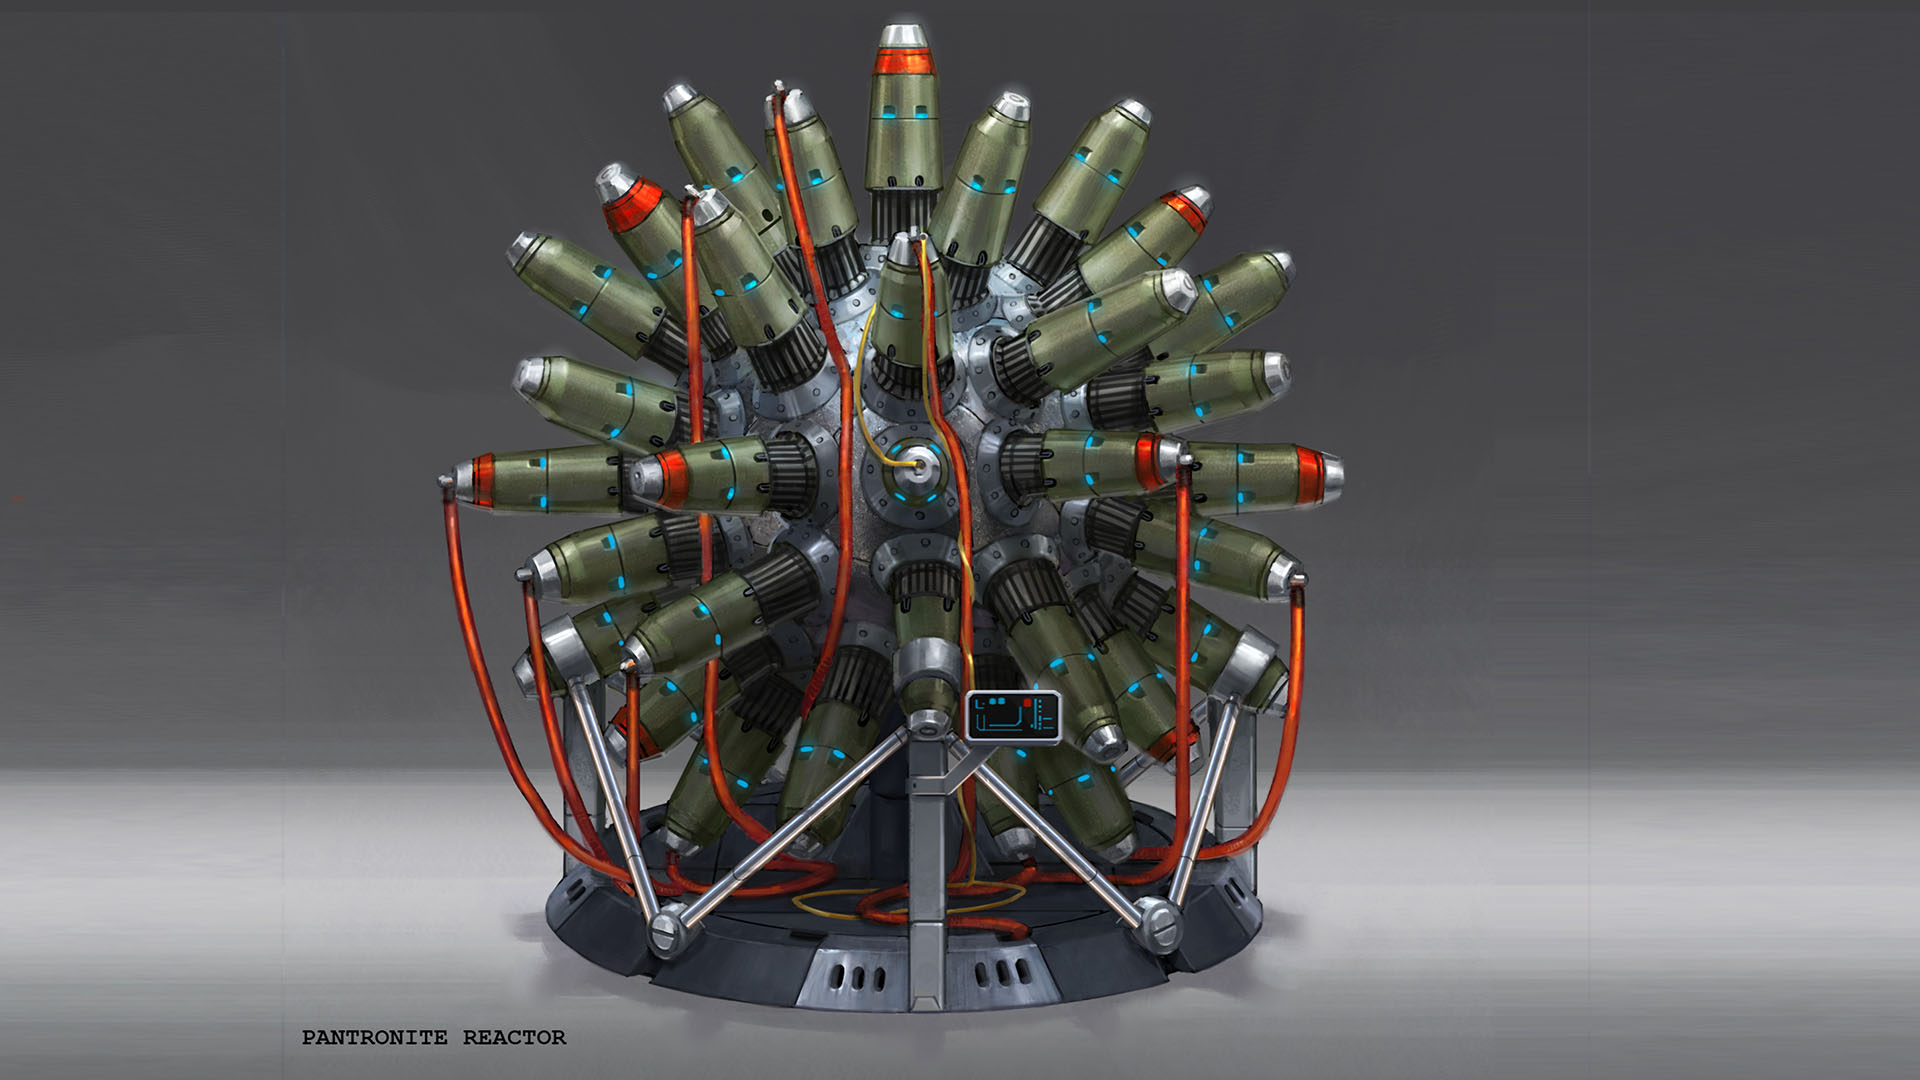 pantronite reactor final